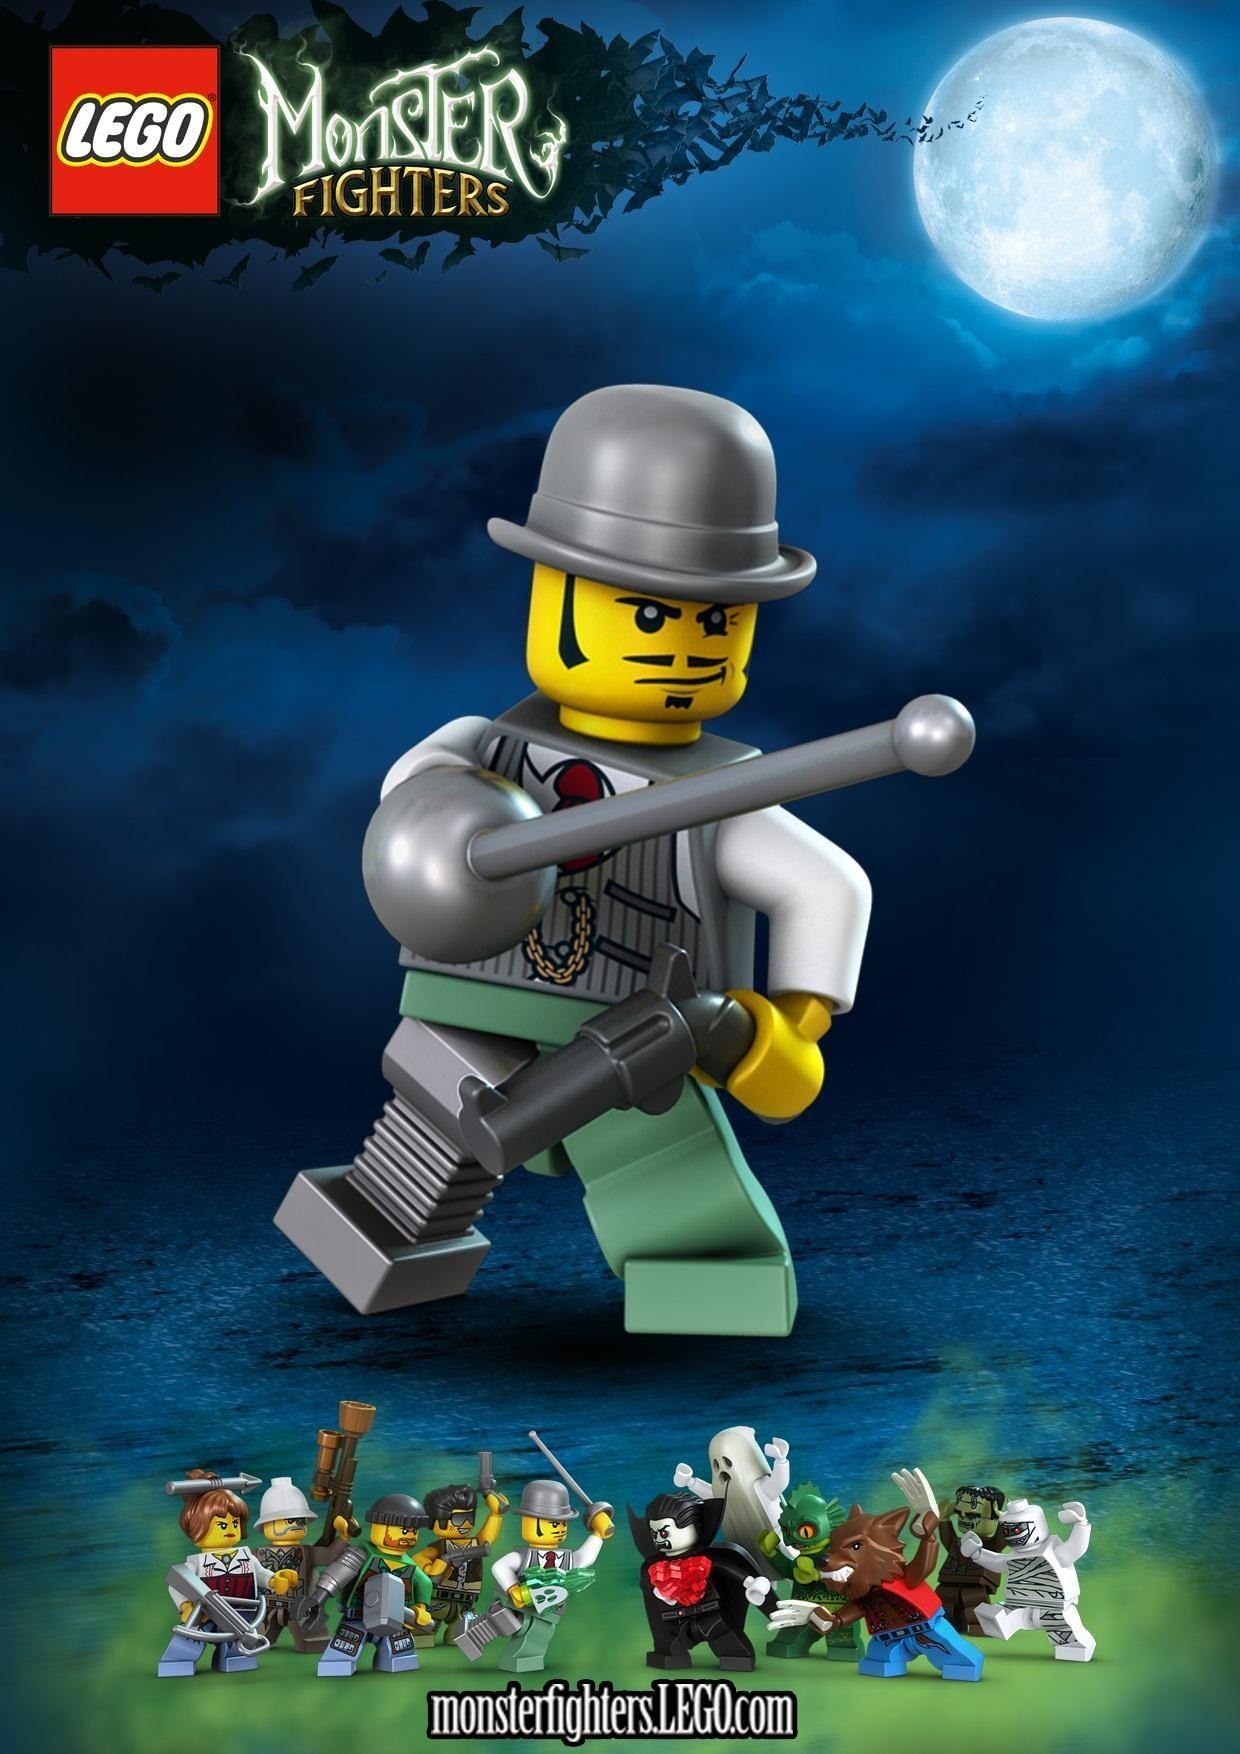 why-legos-new-monster-fighters-screams-steampunk-diy_w1456.jpg